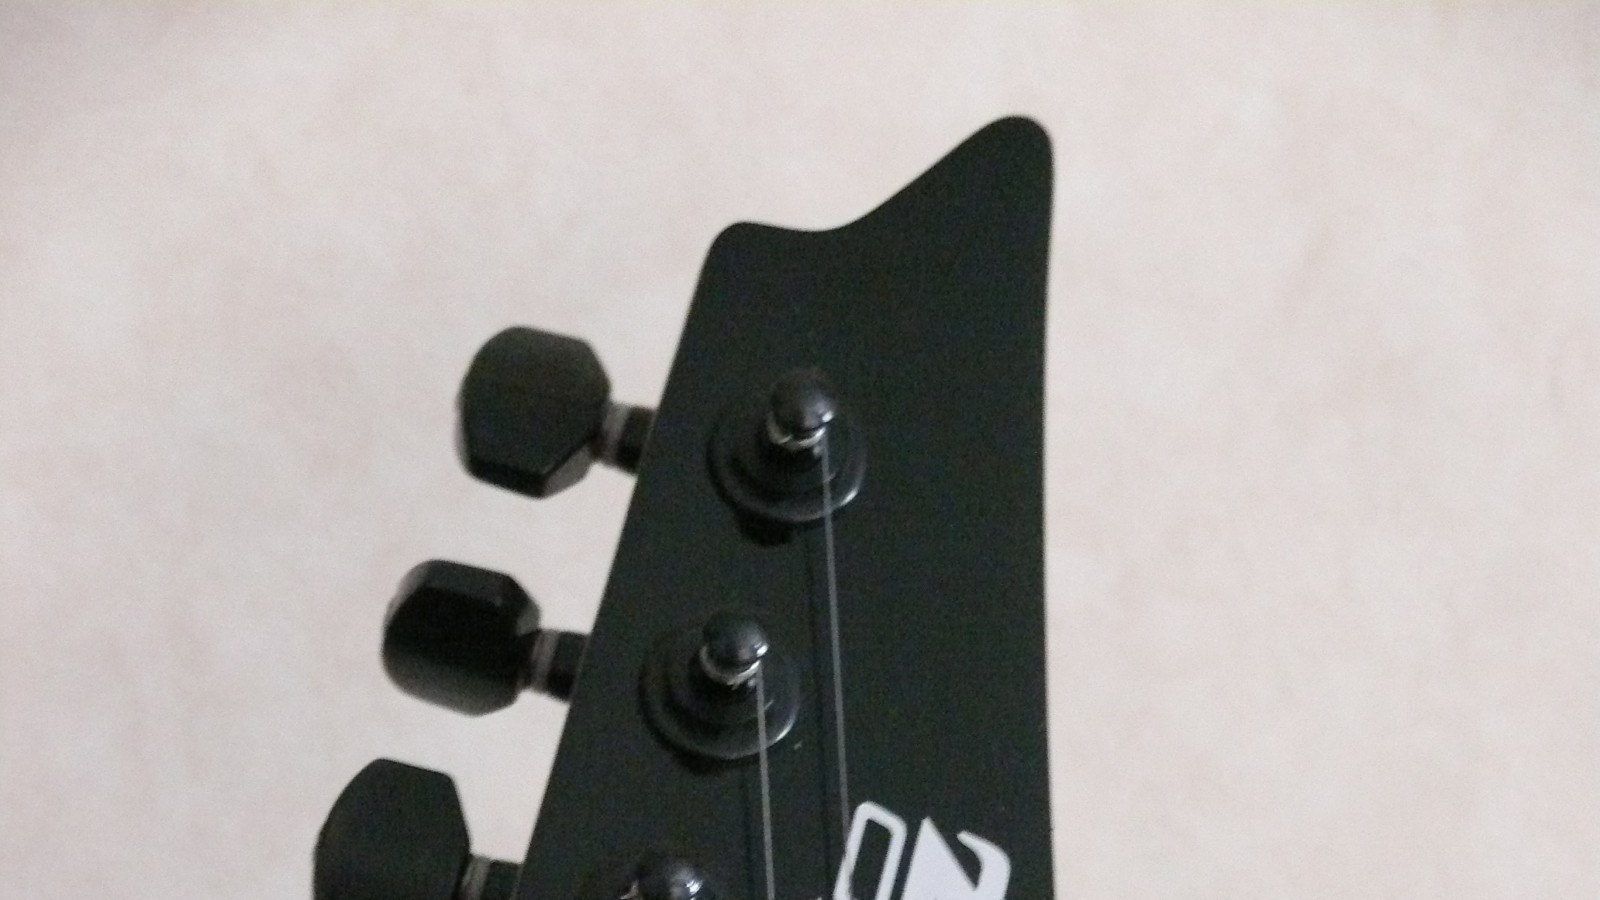 Ibanez electric guitars guitars  Image 2736x3648 HD Wallpaper